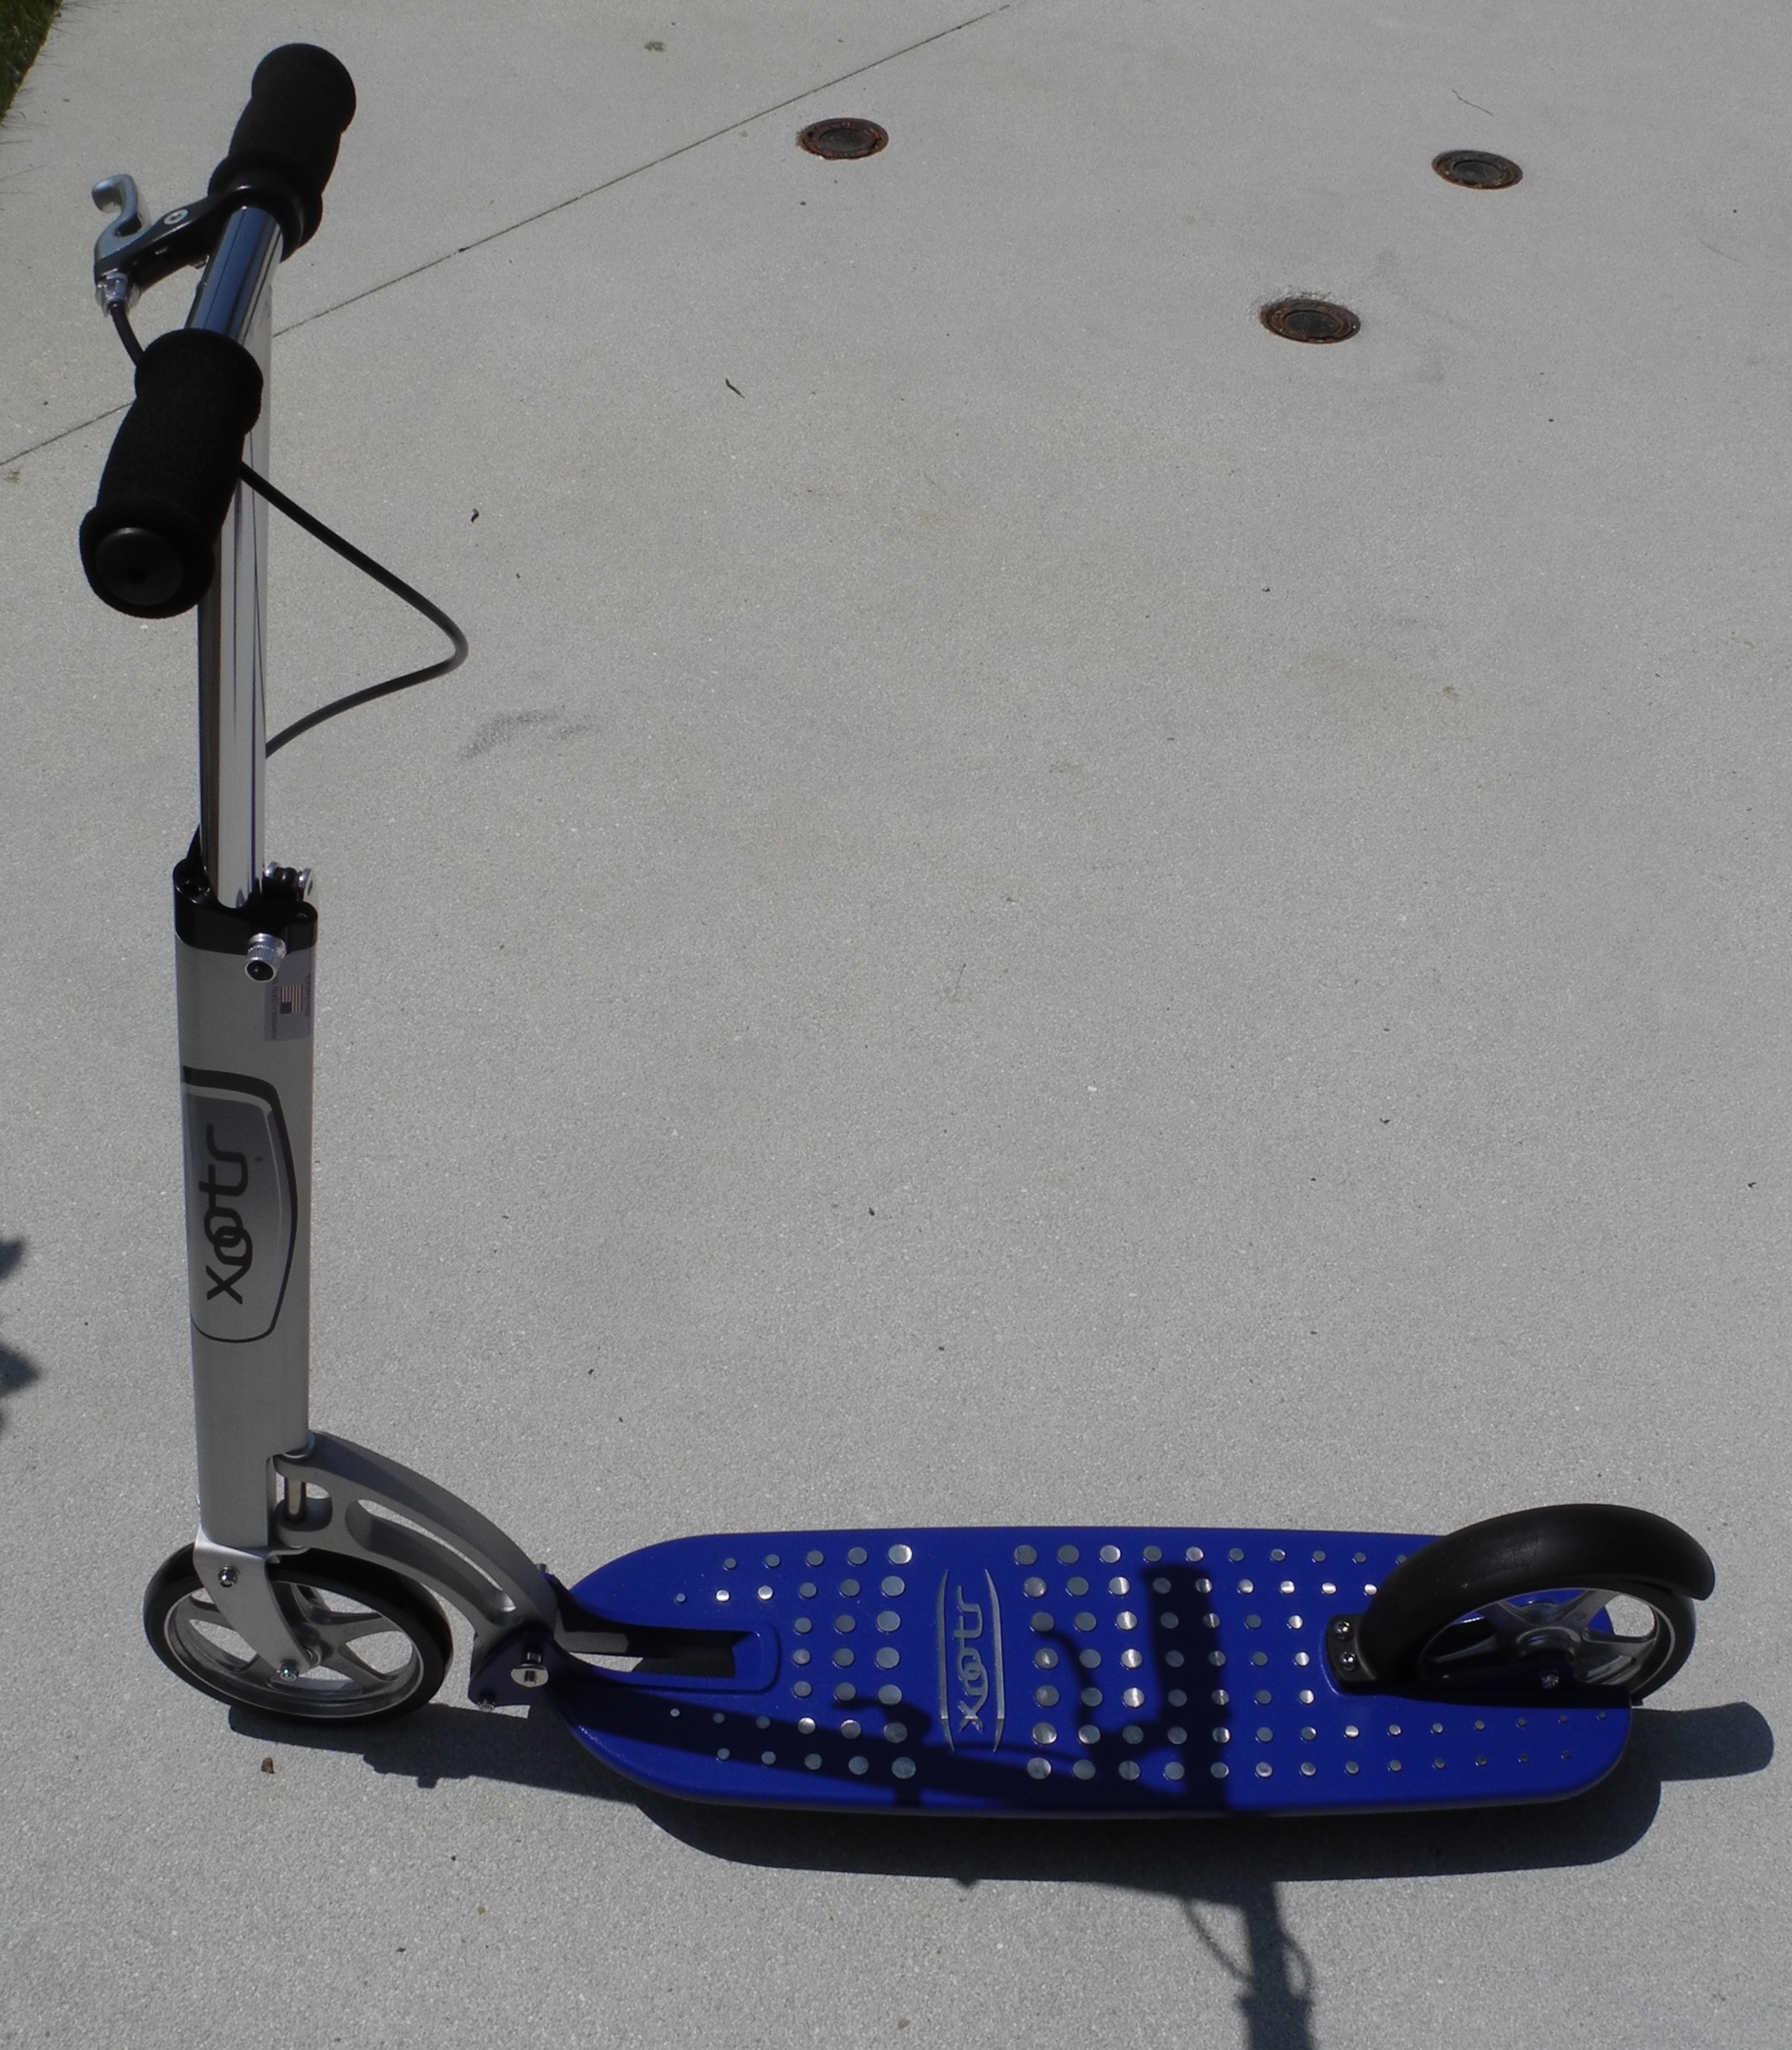 XOOTR MG Bleu-03